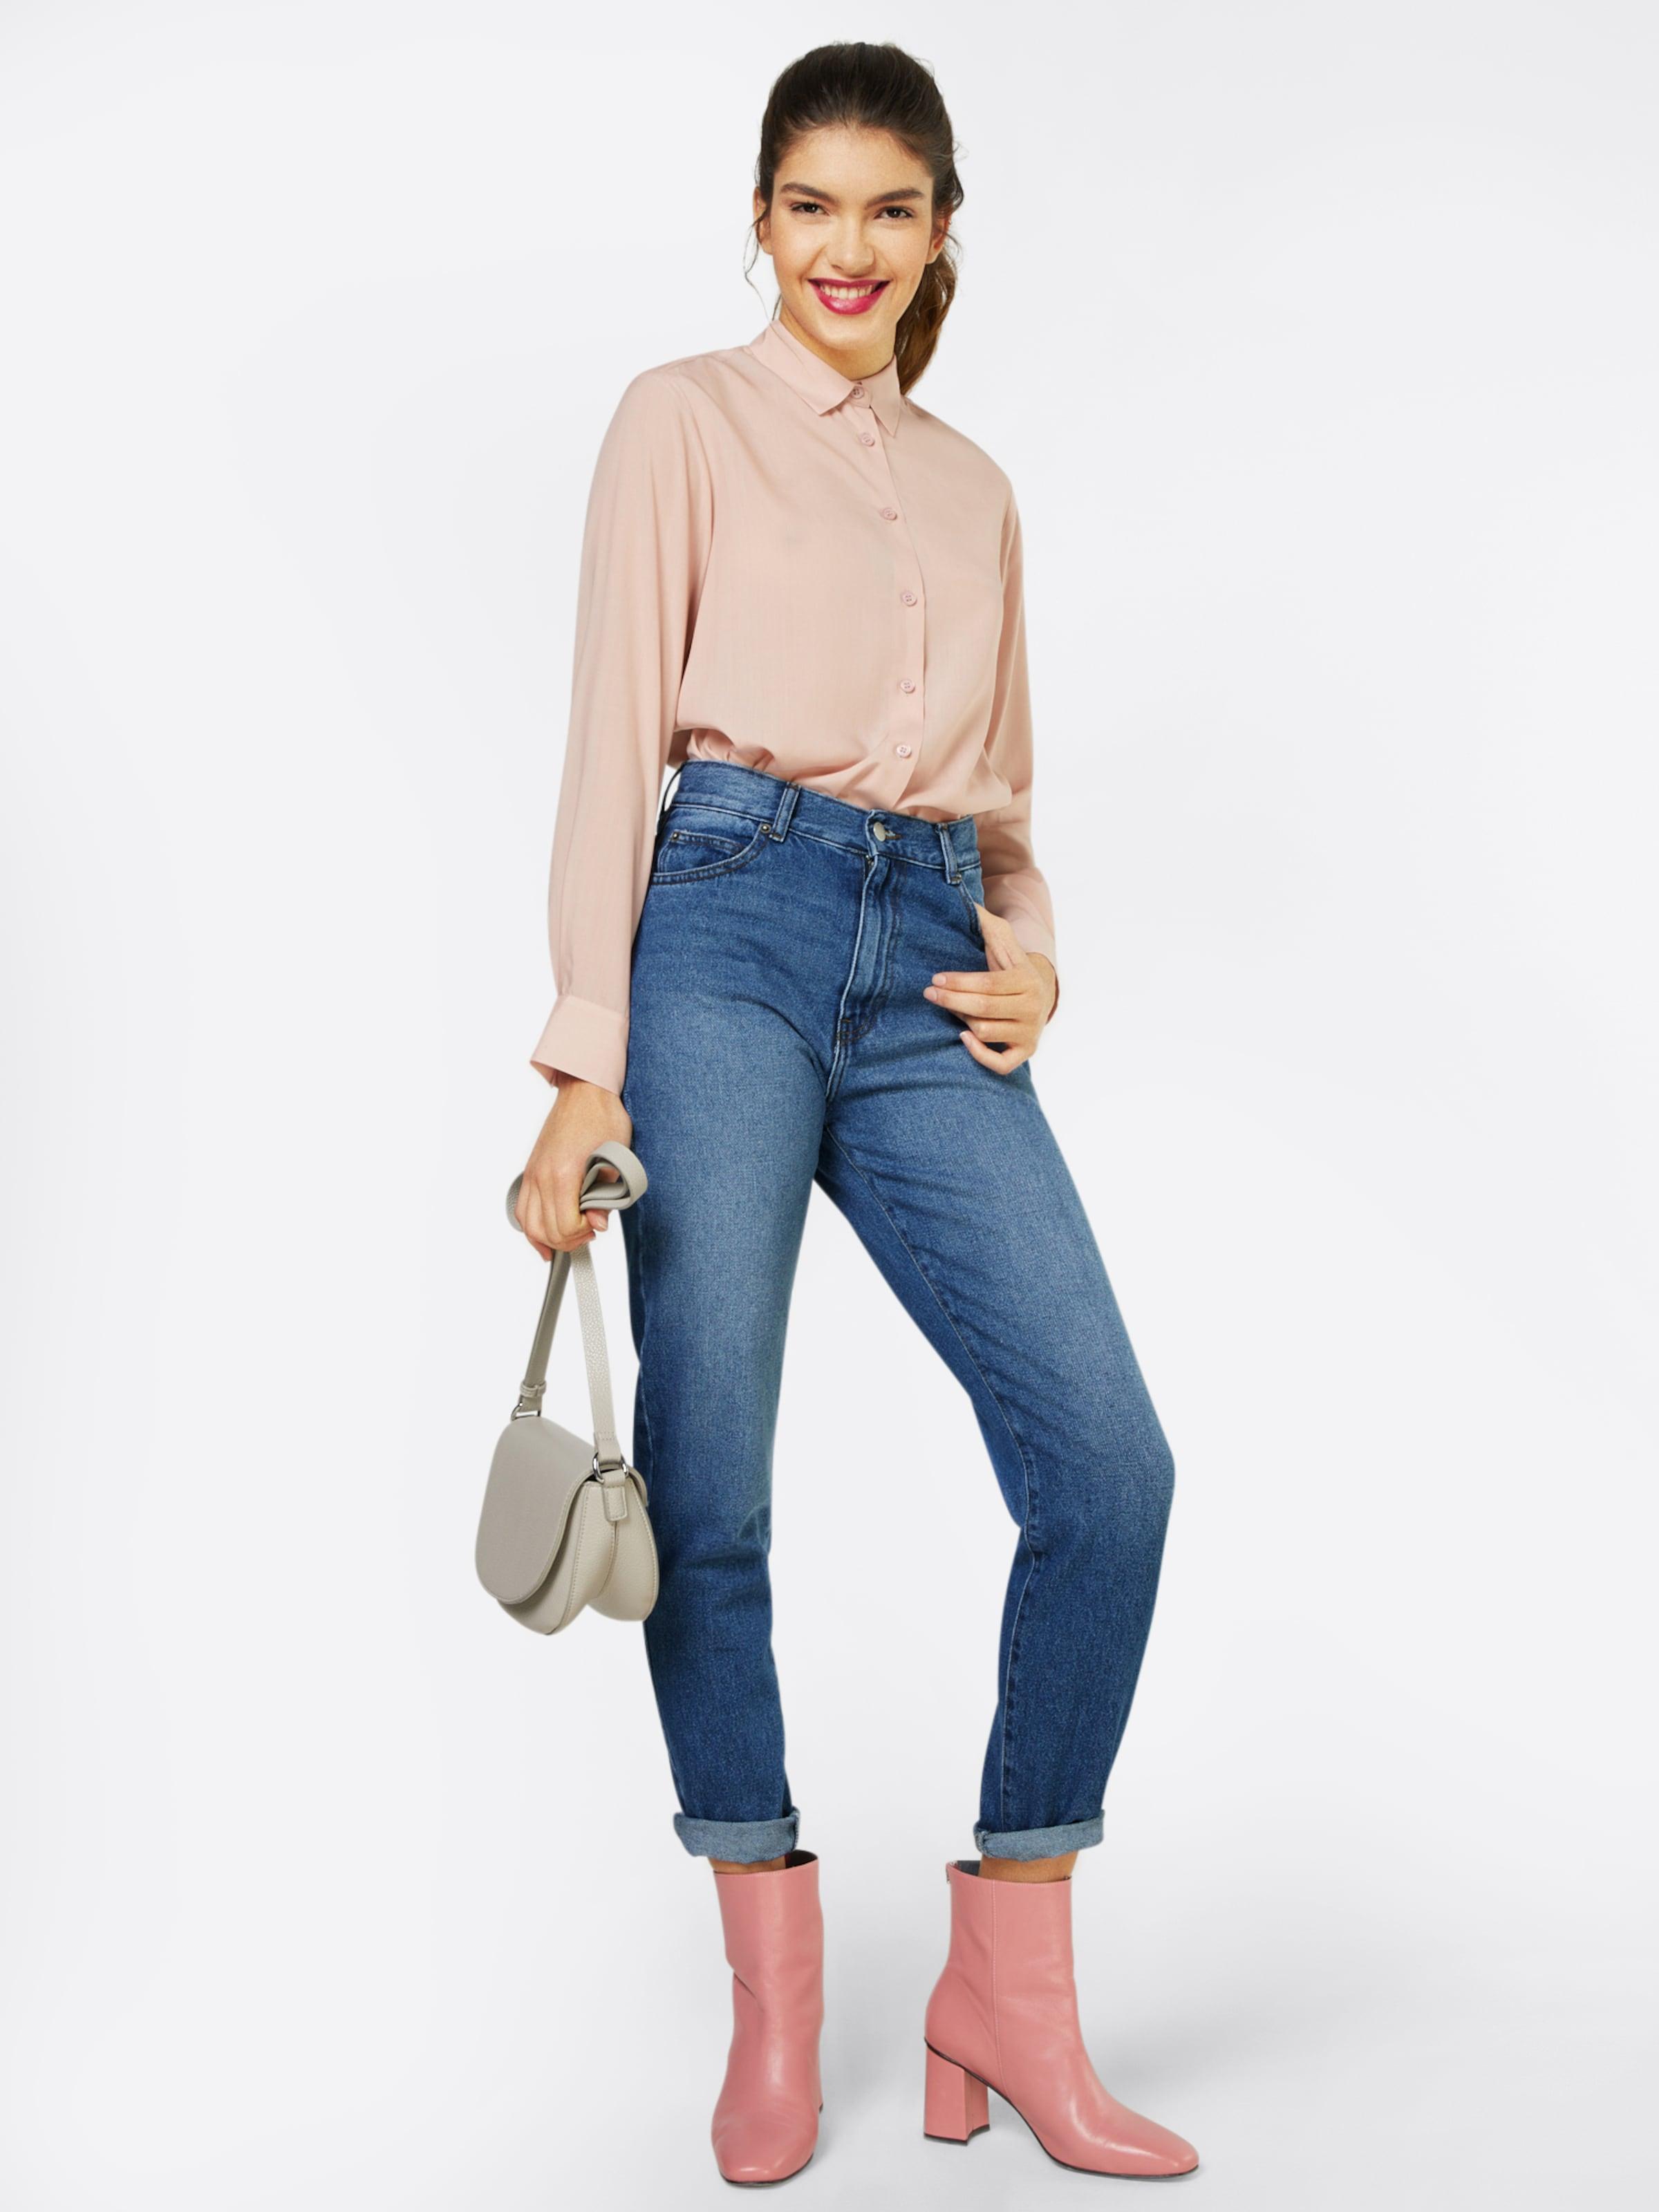 Billig Zum Verkauf Dr. Denim Loosefit-Jeans 'Nora' Rabatt Top-Qualität cHcwKJikL